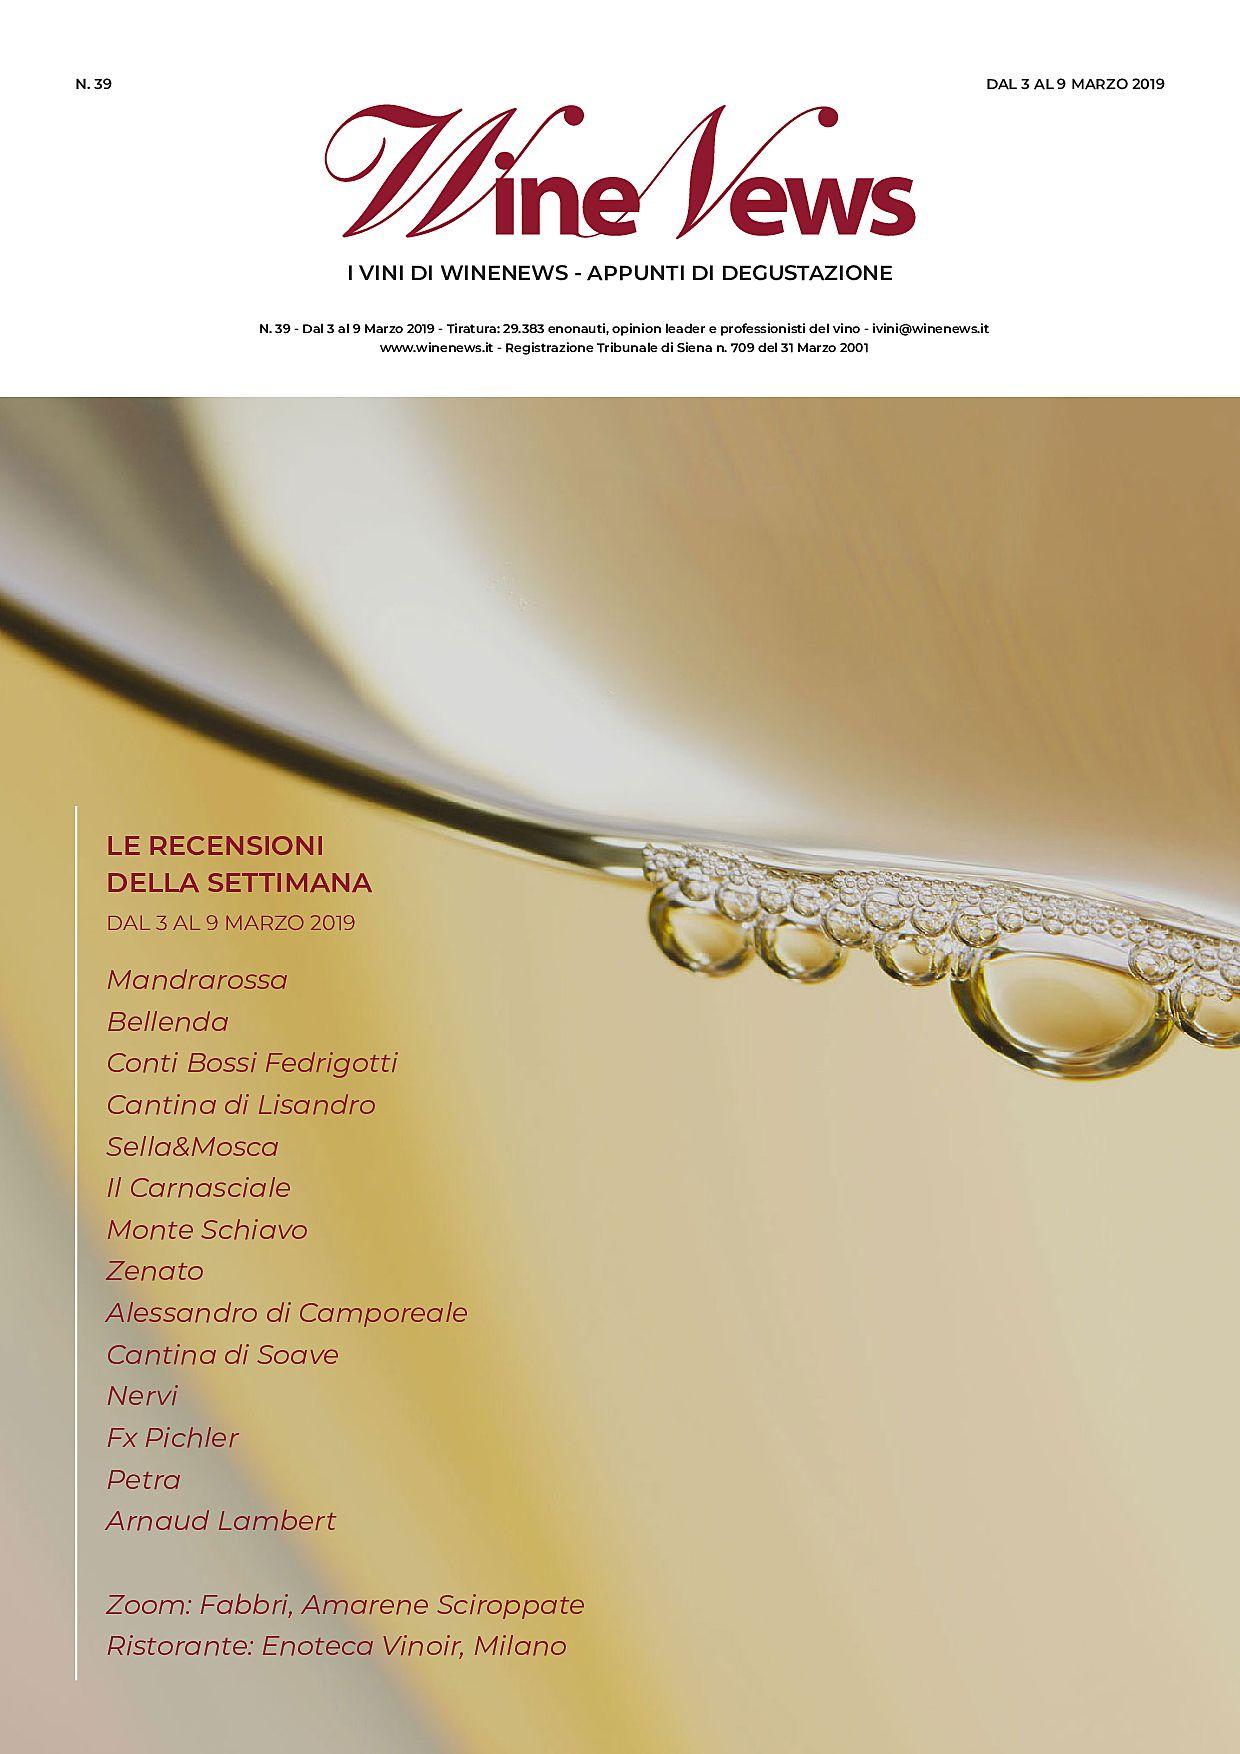 https://winenews.it/php/redirect_pdf.php?id=385243&t=1551453241